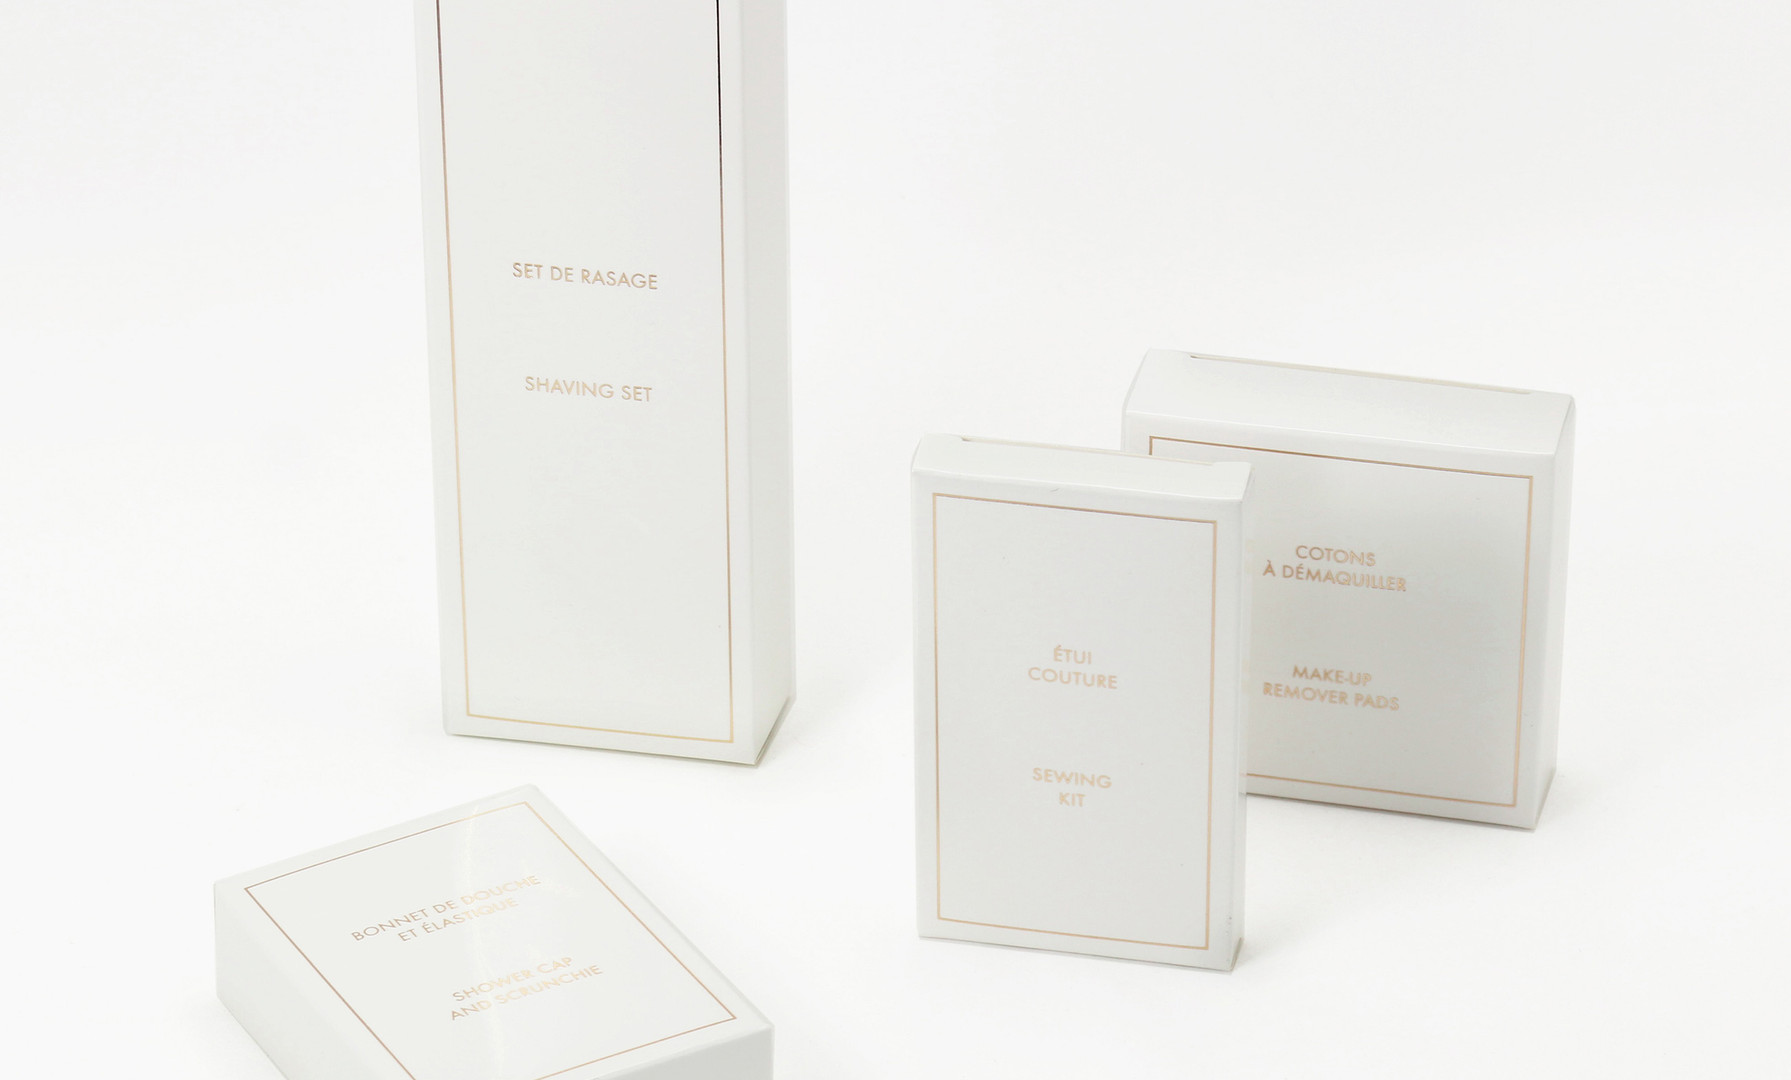 Guerlain-Accessoires.jpg